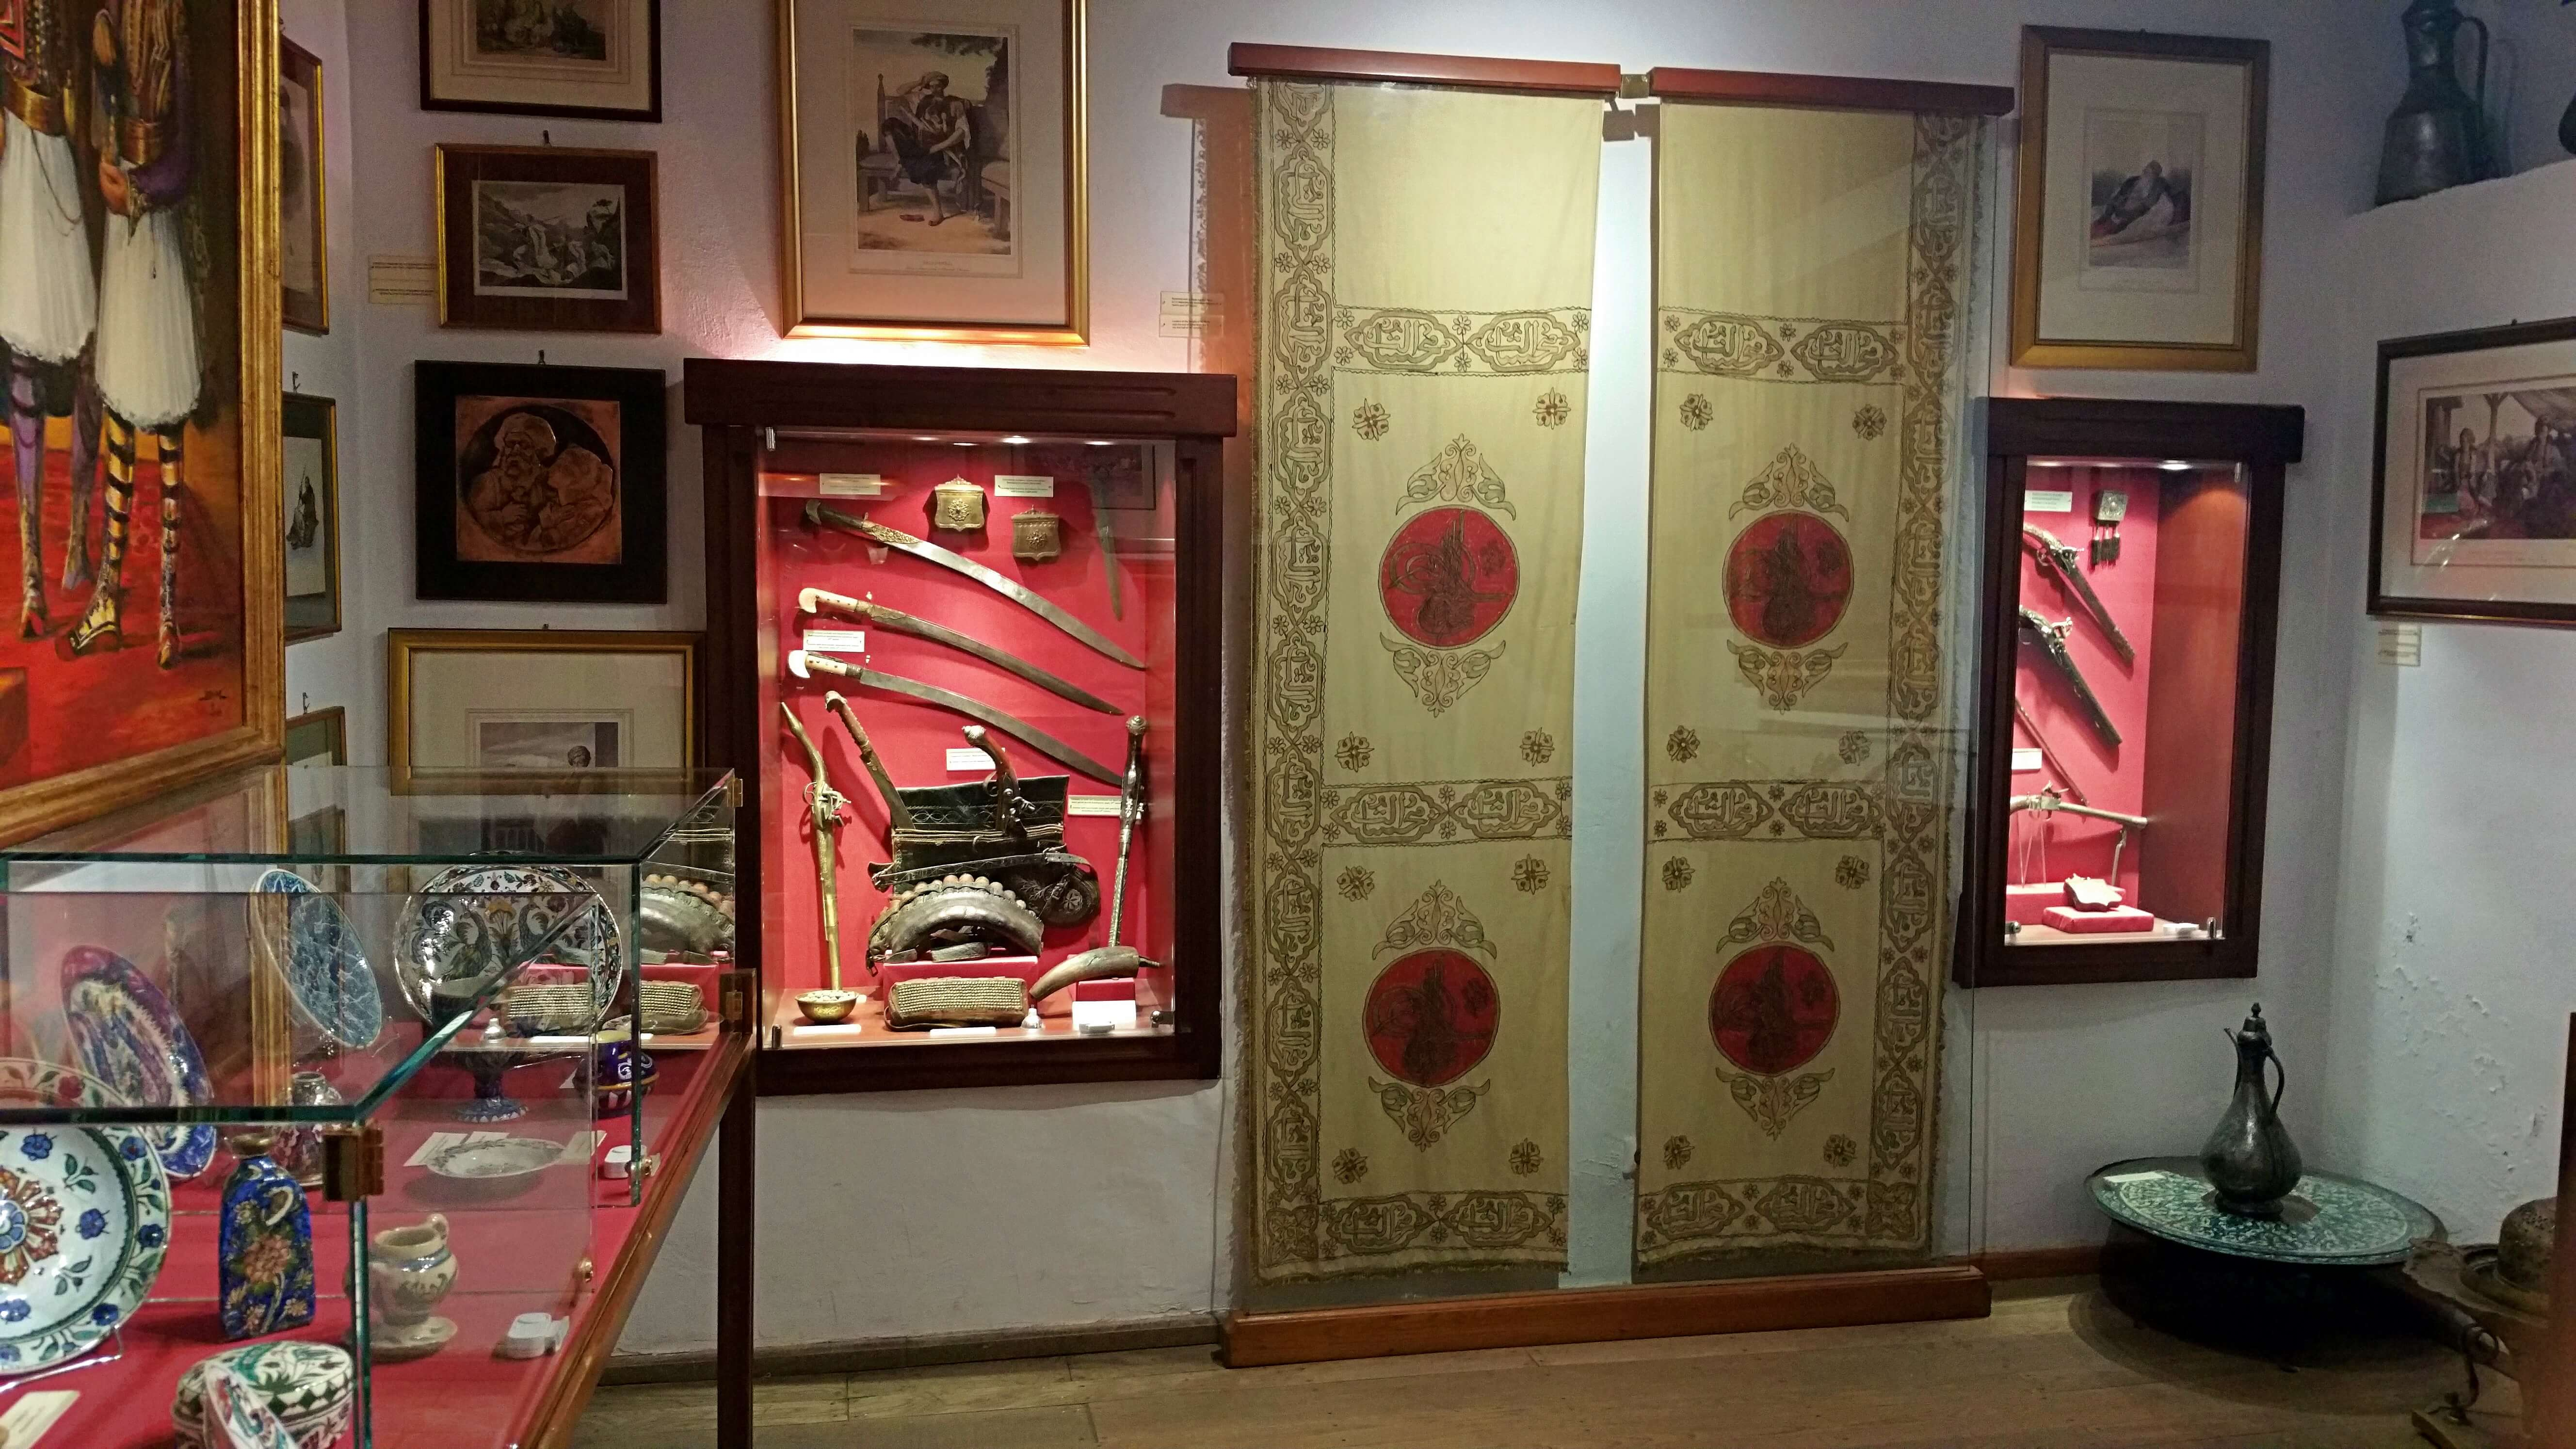 The Curtain of Sultan Mahmud Room - Ali Pasha Museum, Ioannina, Greece | Kicking Back the Pebbles